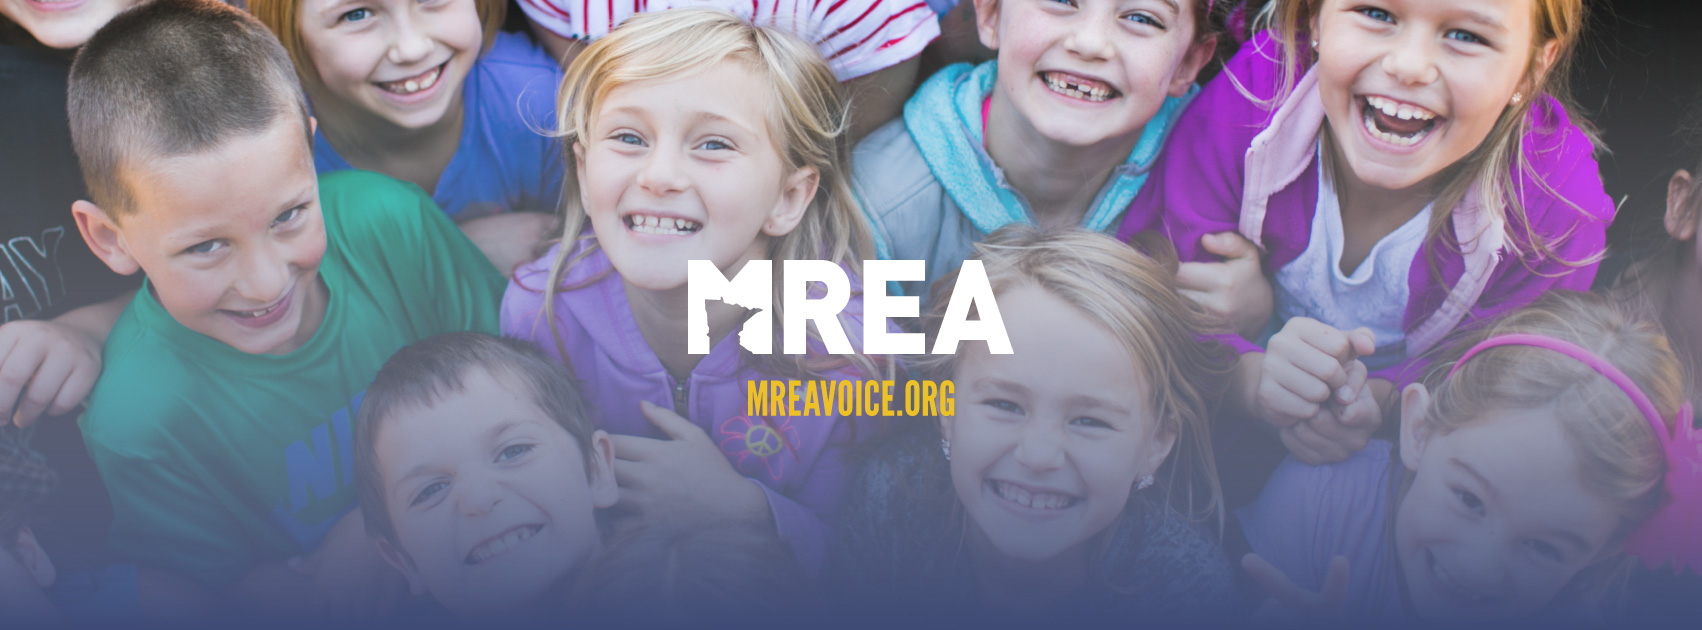 Share MREA News with School Leaders